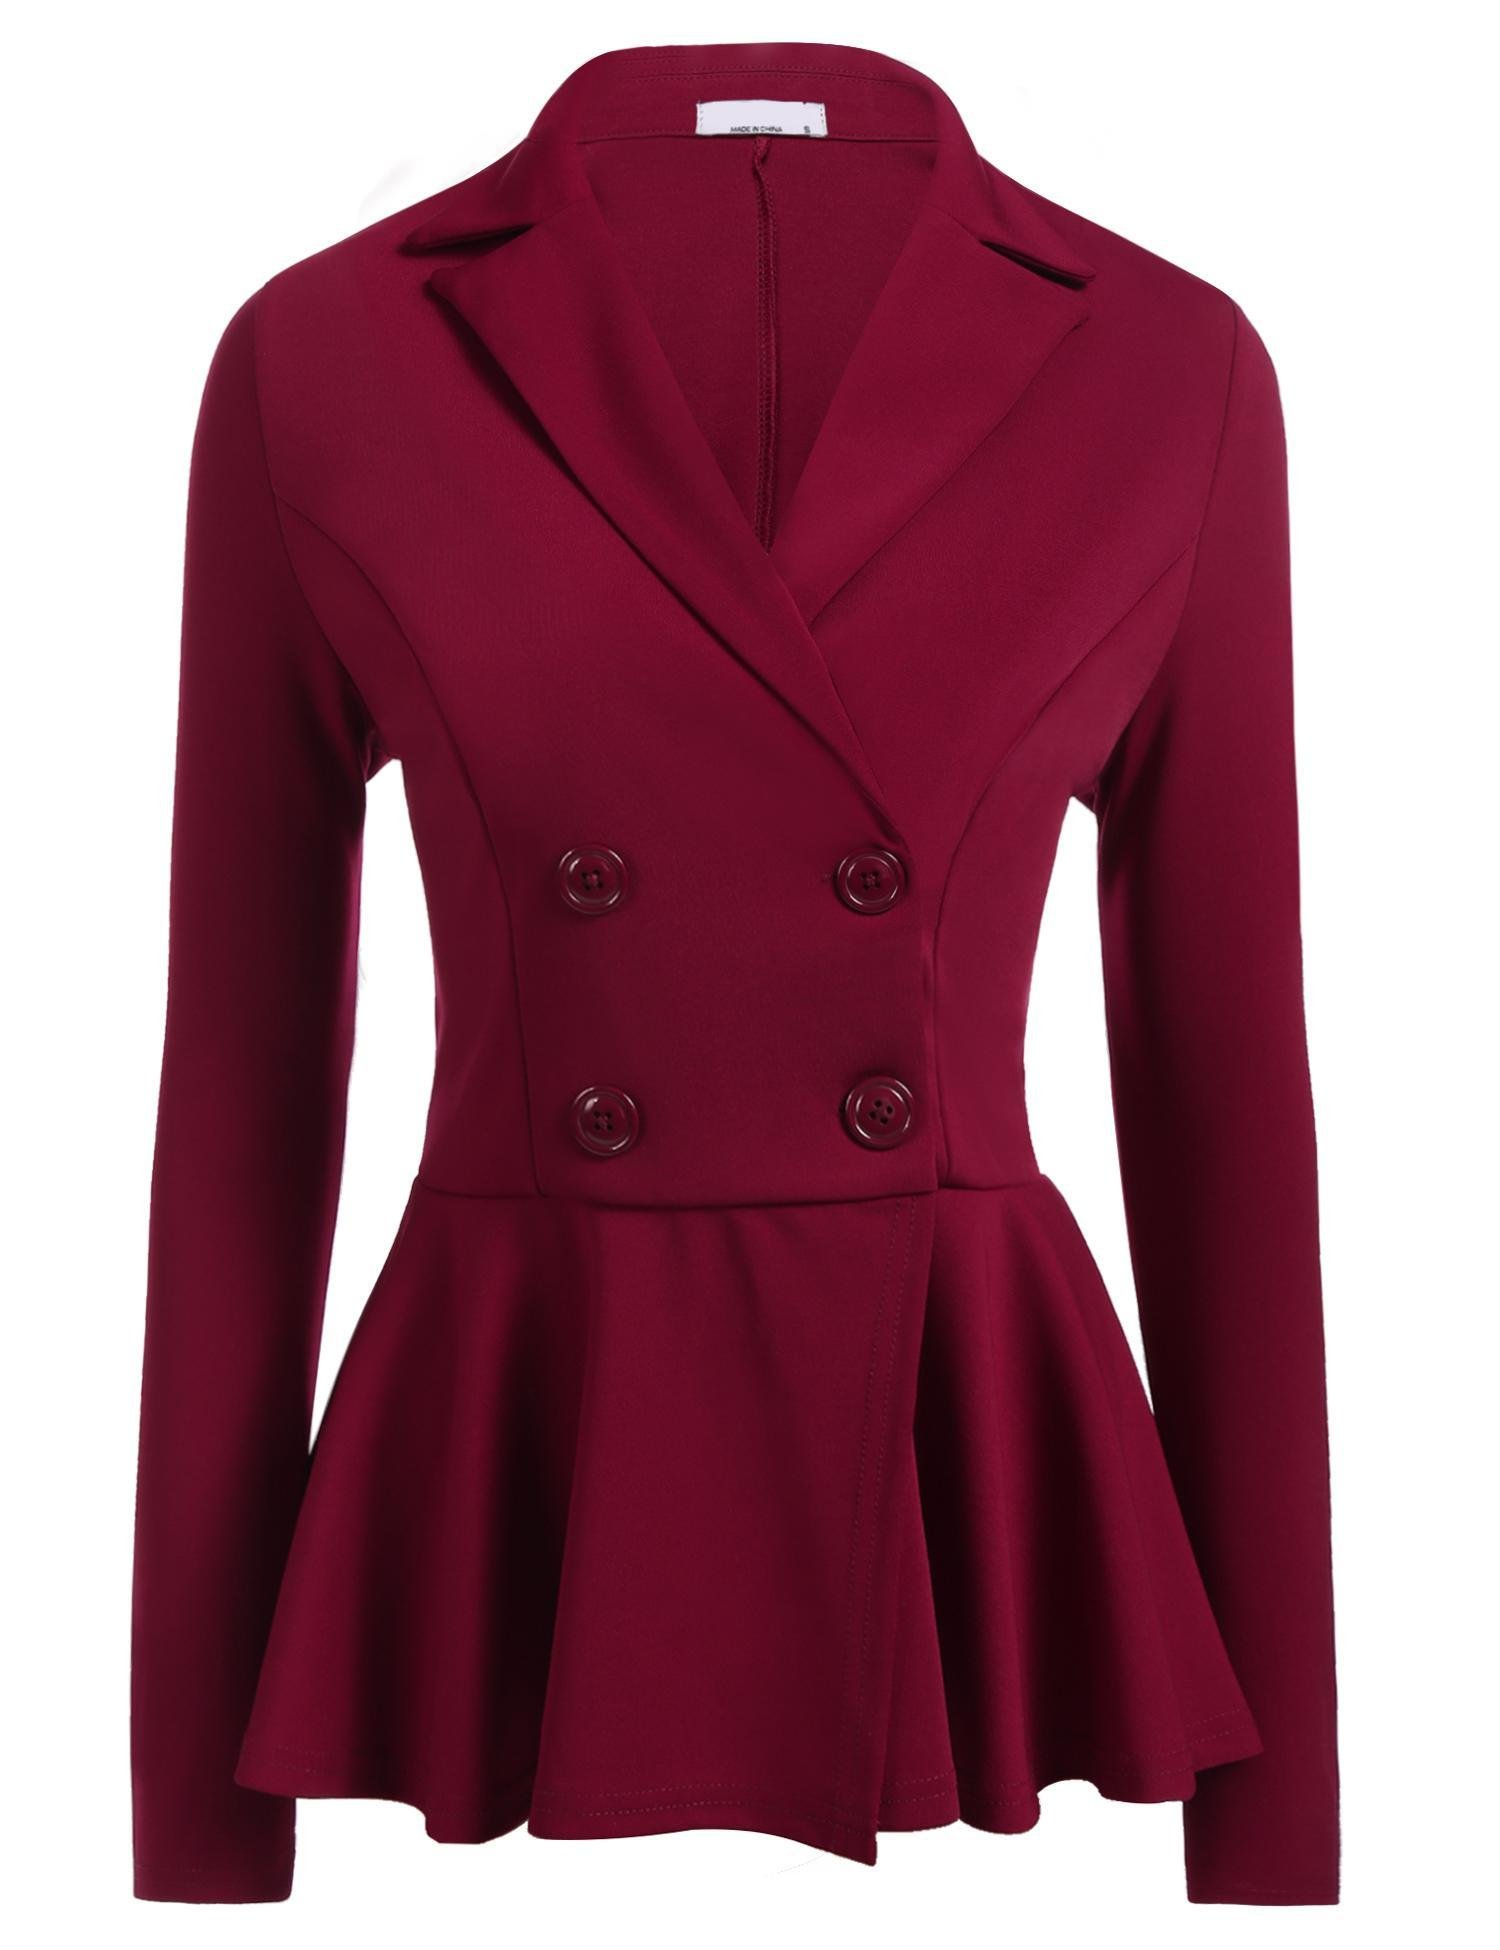 ELESOL Women's Work Office Blazer Casual Long Sleeve Lapel Lightweight Jacket Buttons Wine Red XXL